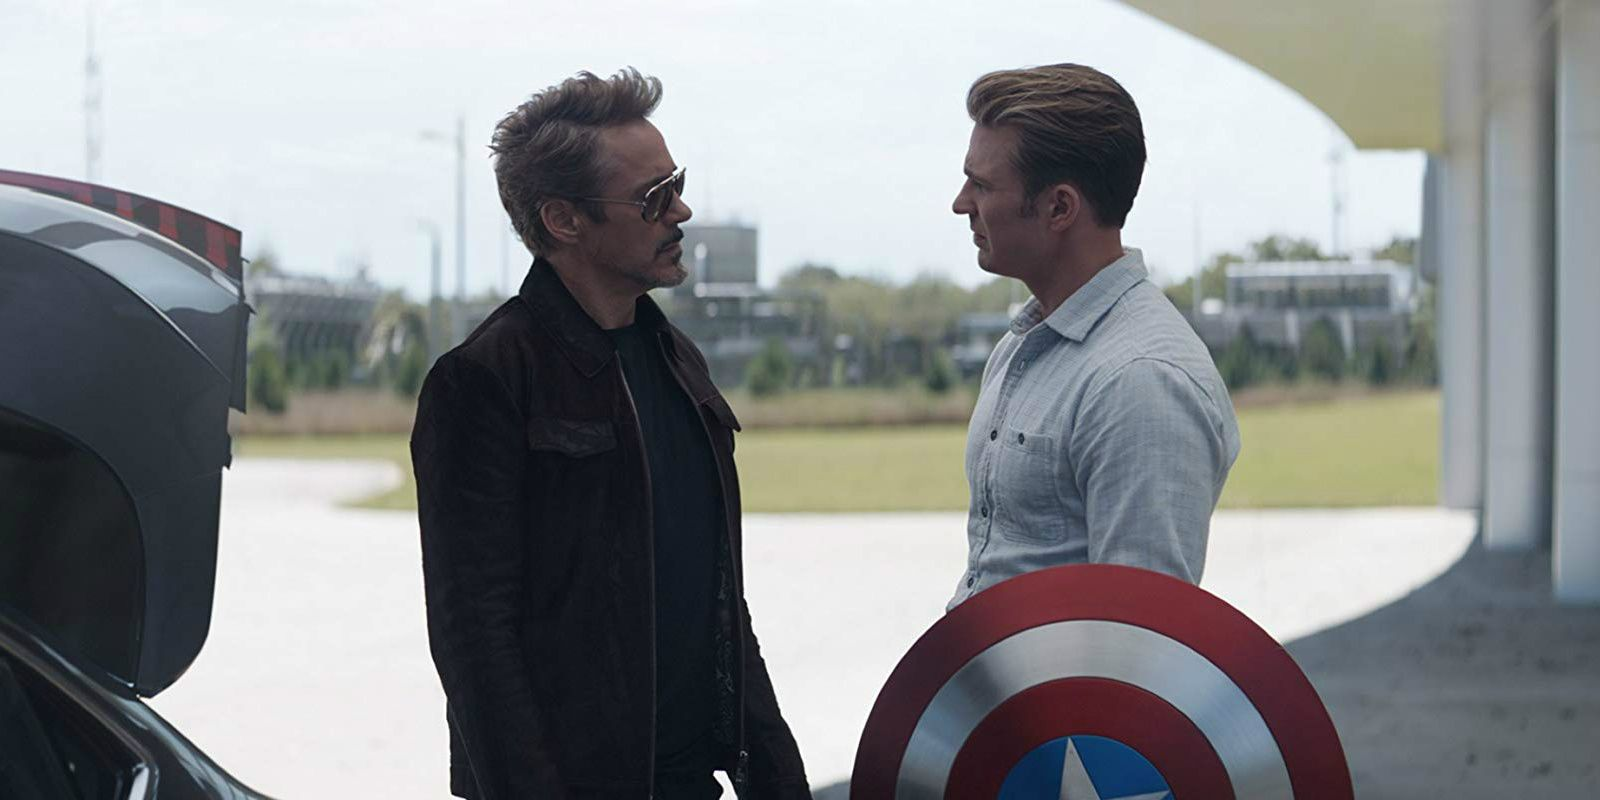 Endgame: RDJ Explains Deeper Meaning to Iron Man & Cap's Reunion Scene